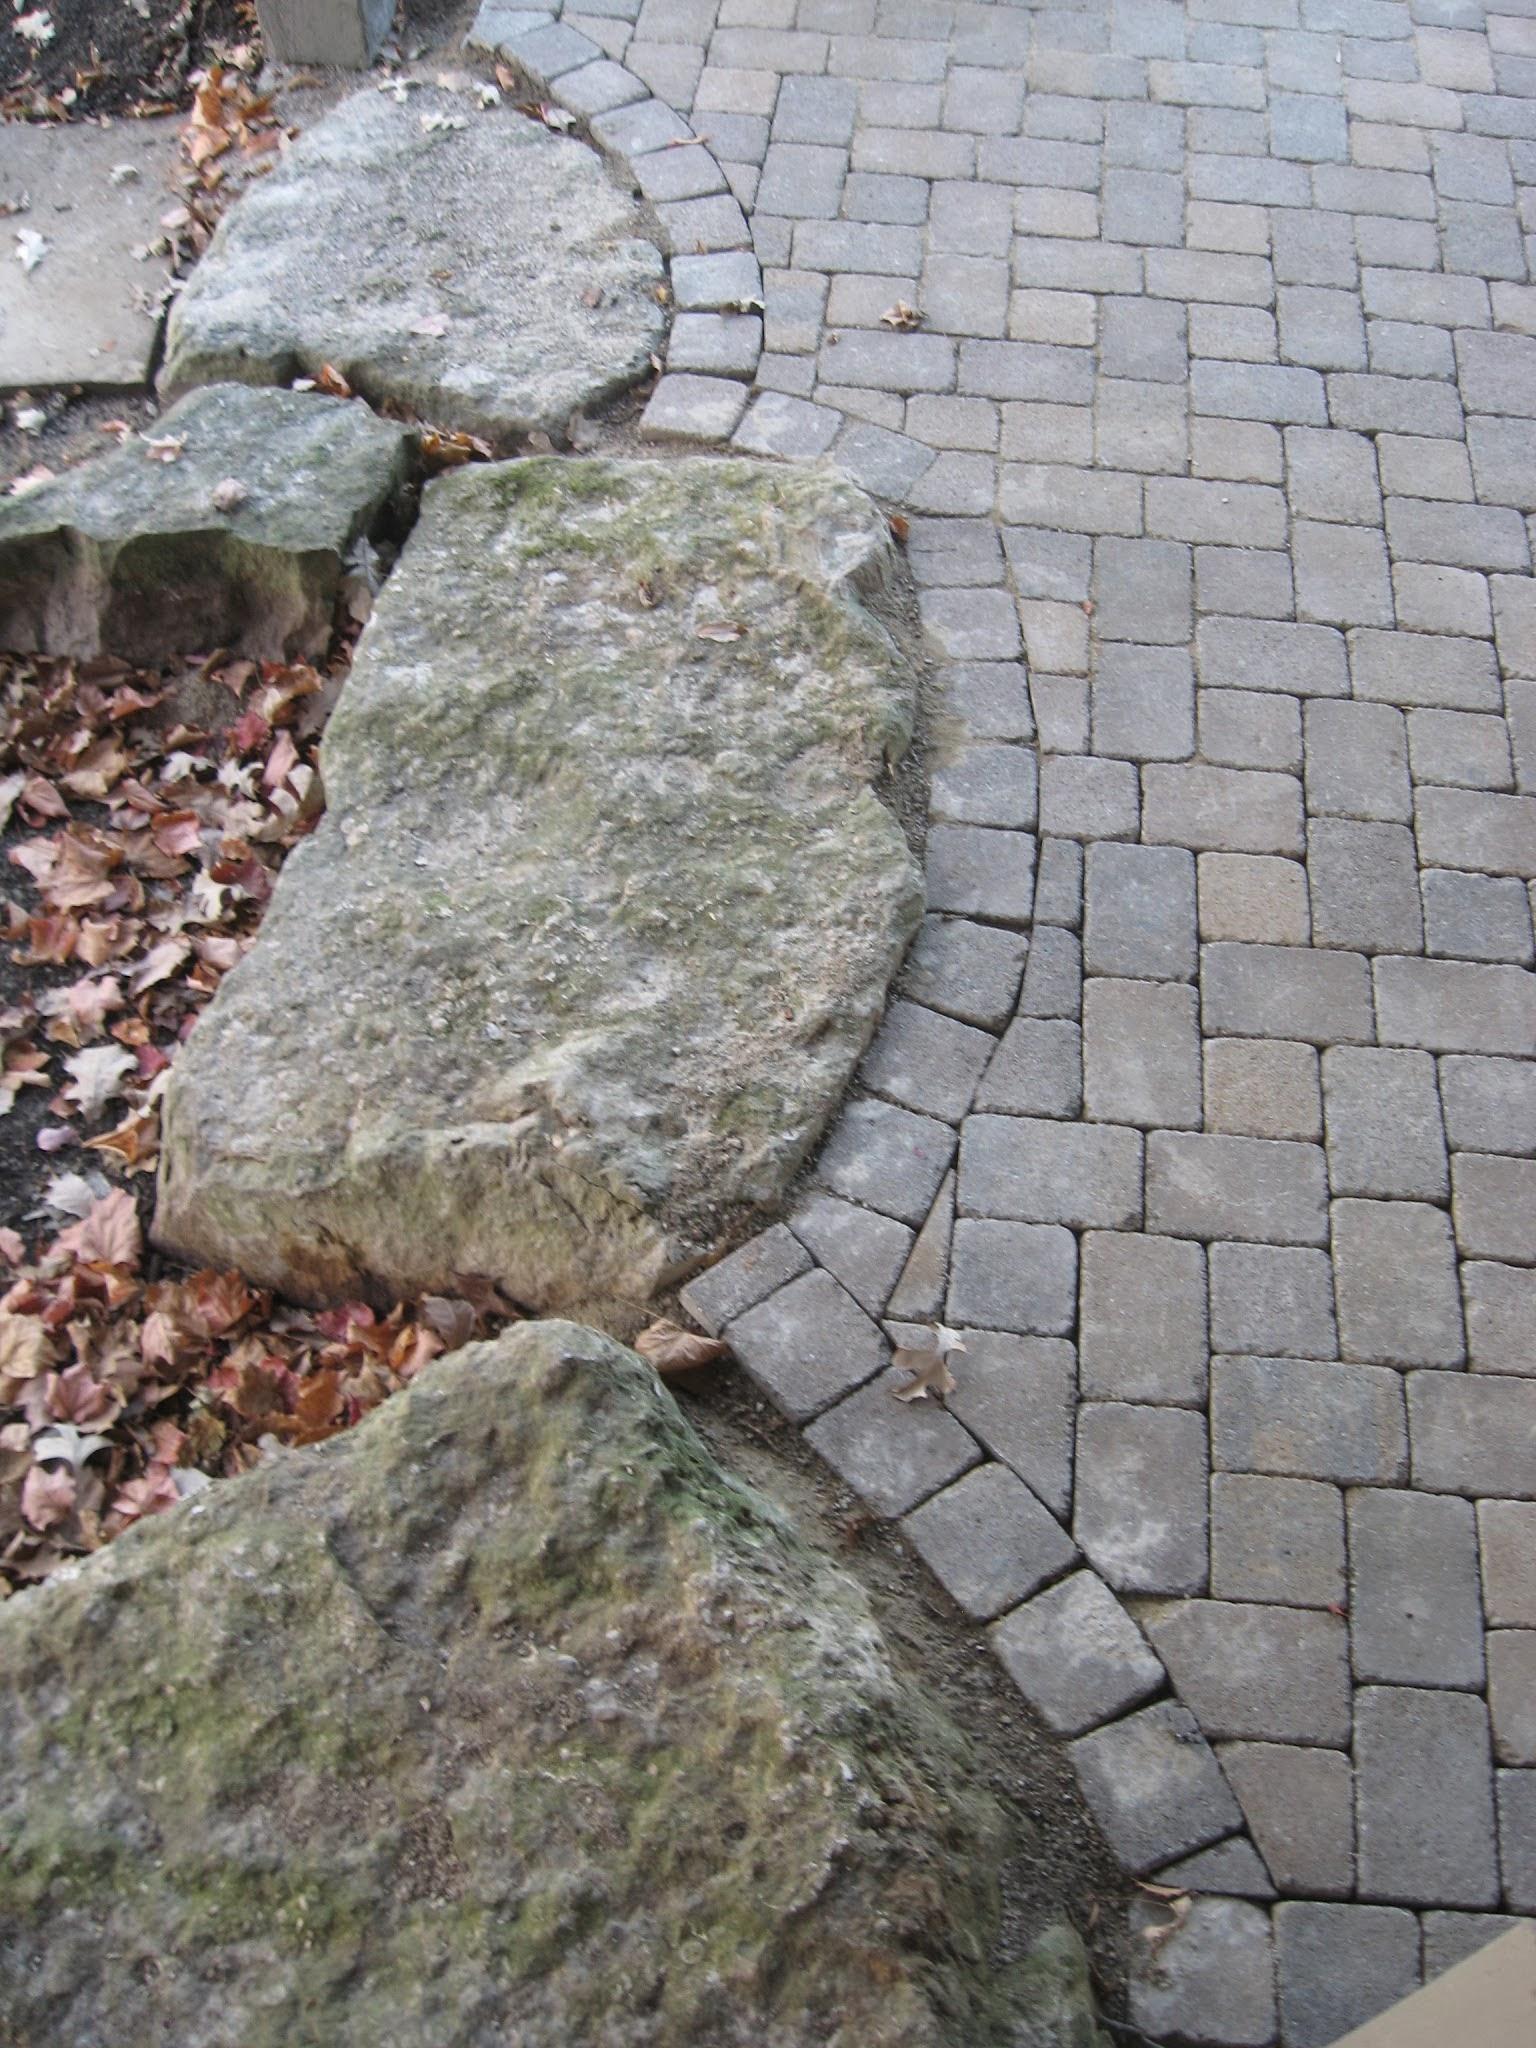 Concrete brick paver